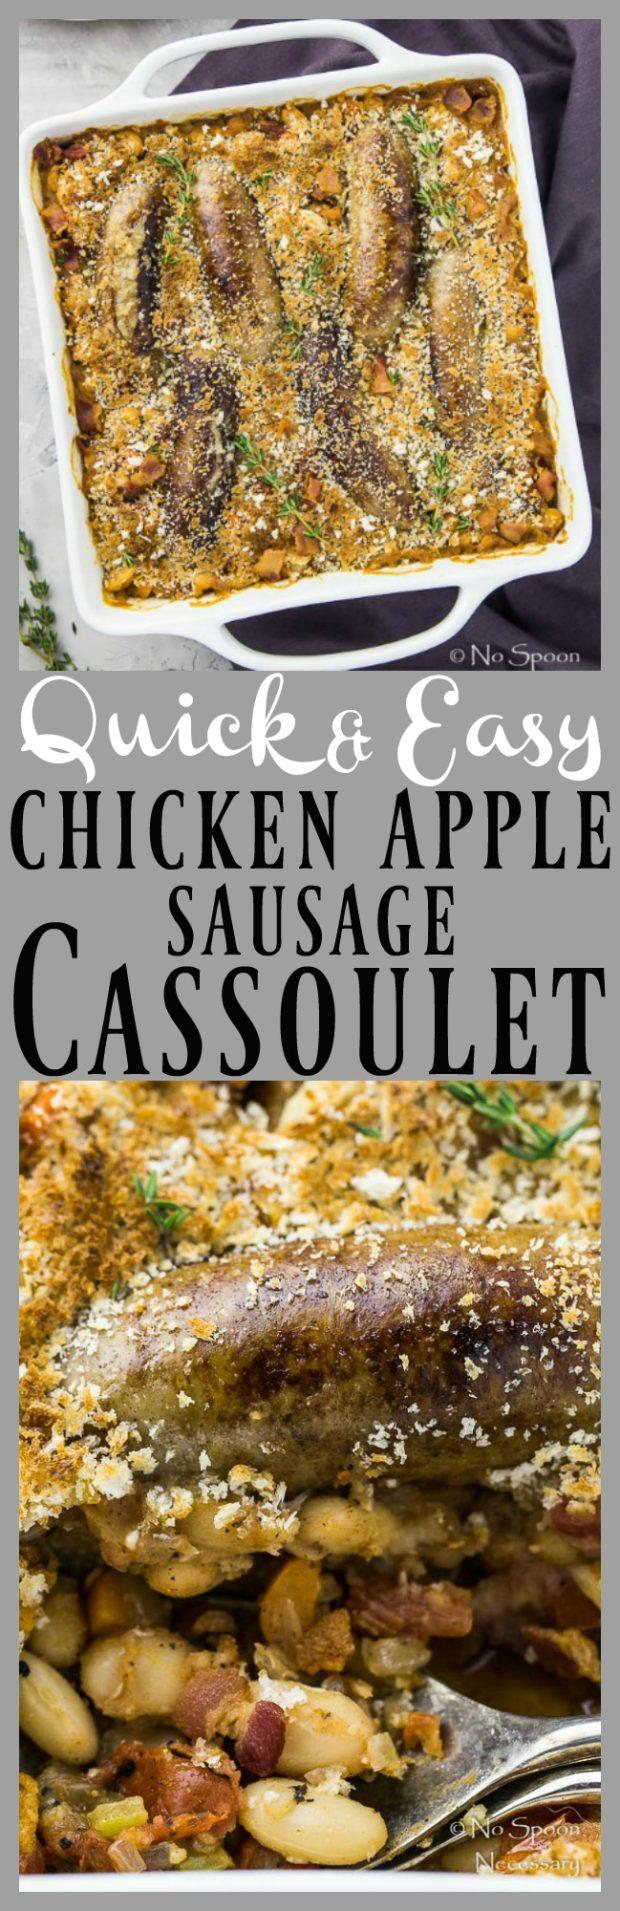 Chicken Apple Sausage Quick Cassoulet